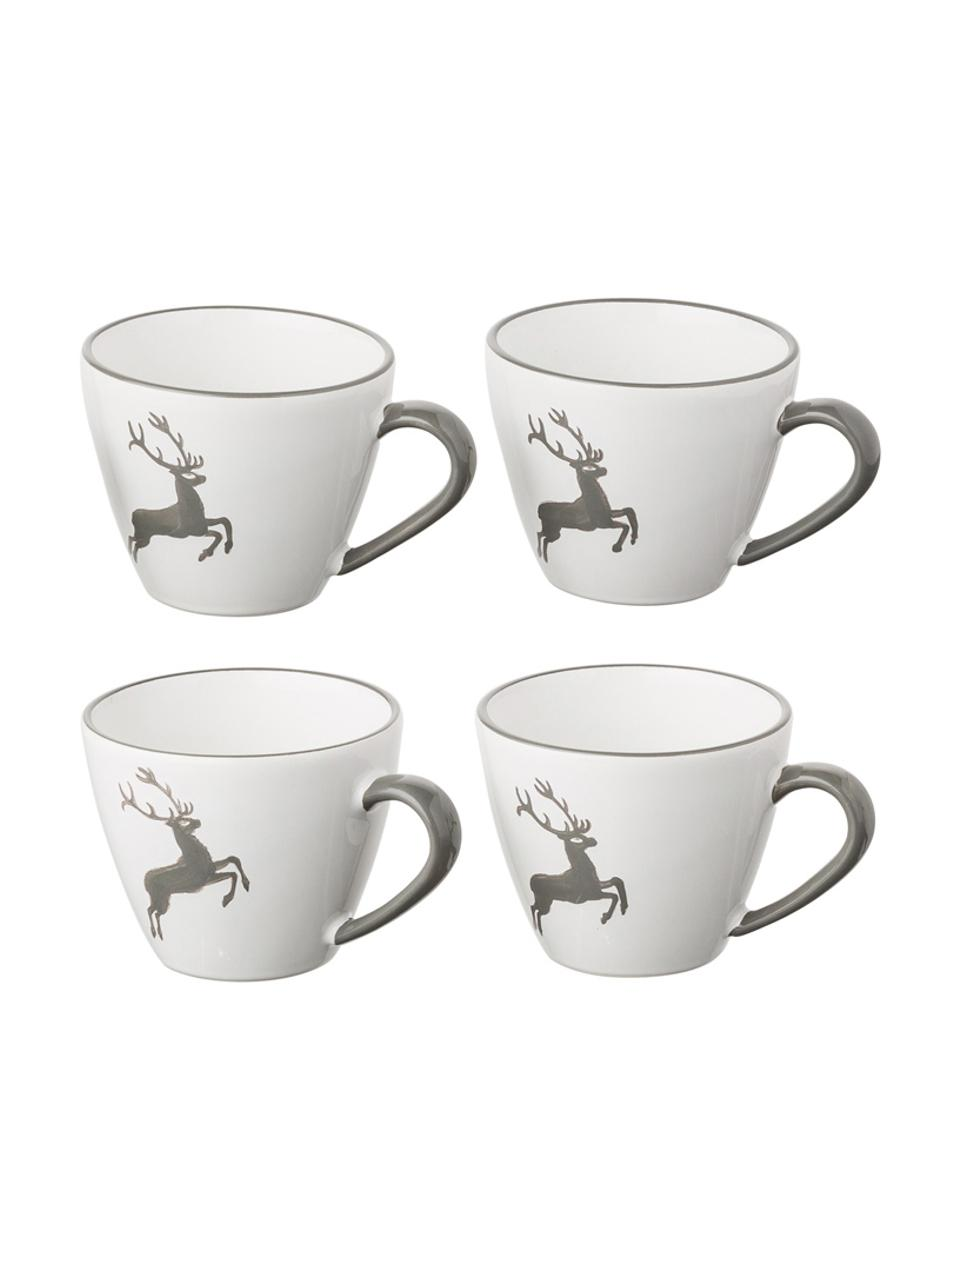 Handbemalte Kaffeetasse Gourmet Grauer Hirsch, Keramik, Grau,Weiß, 200 ml